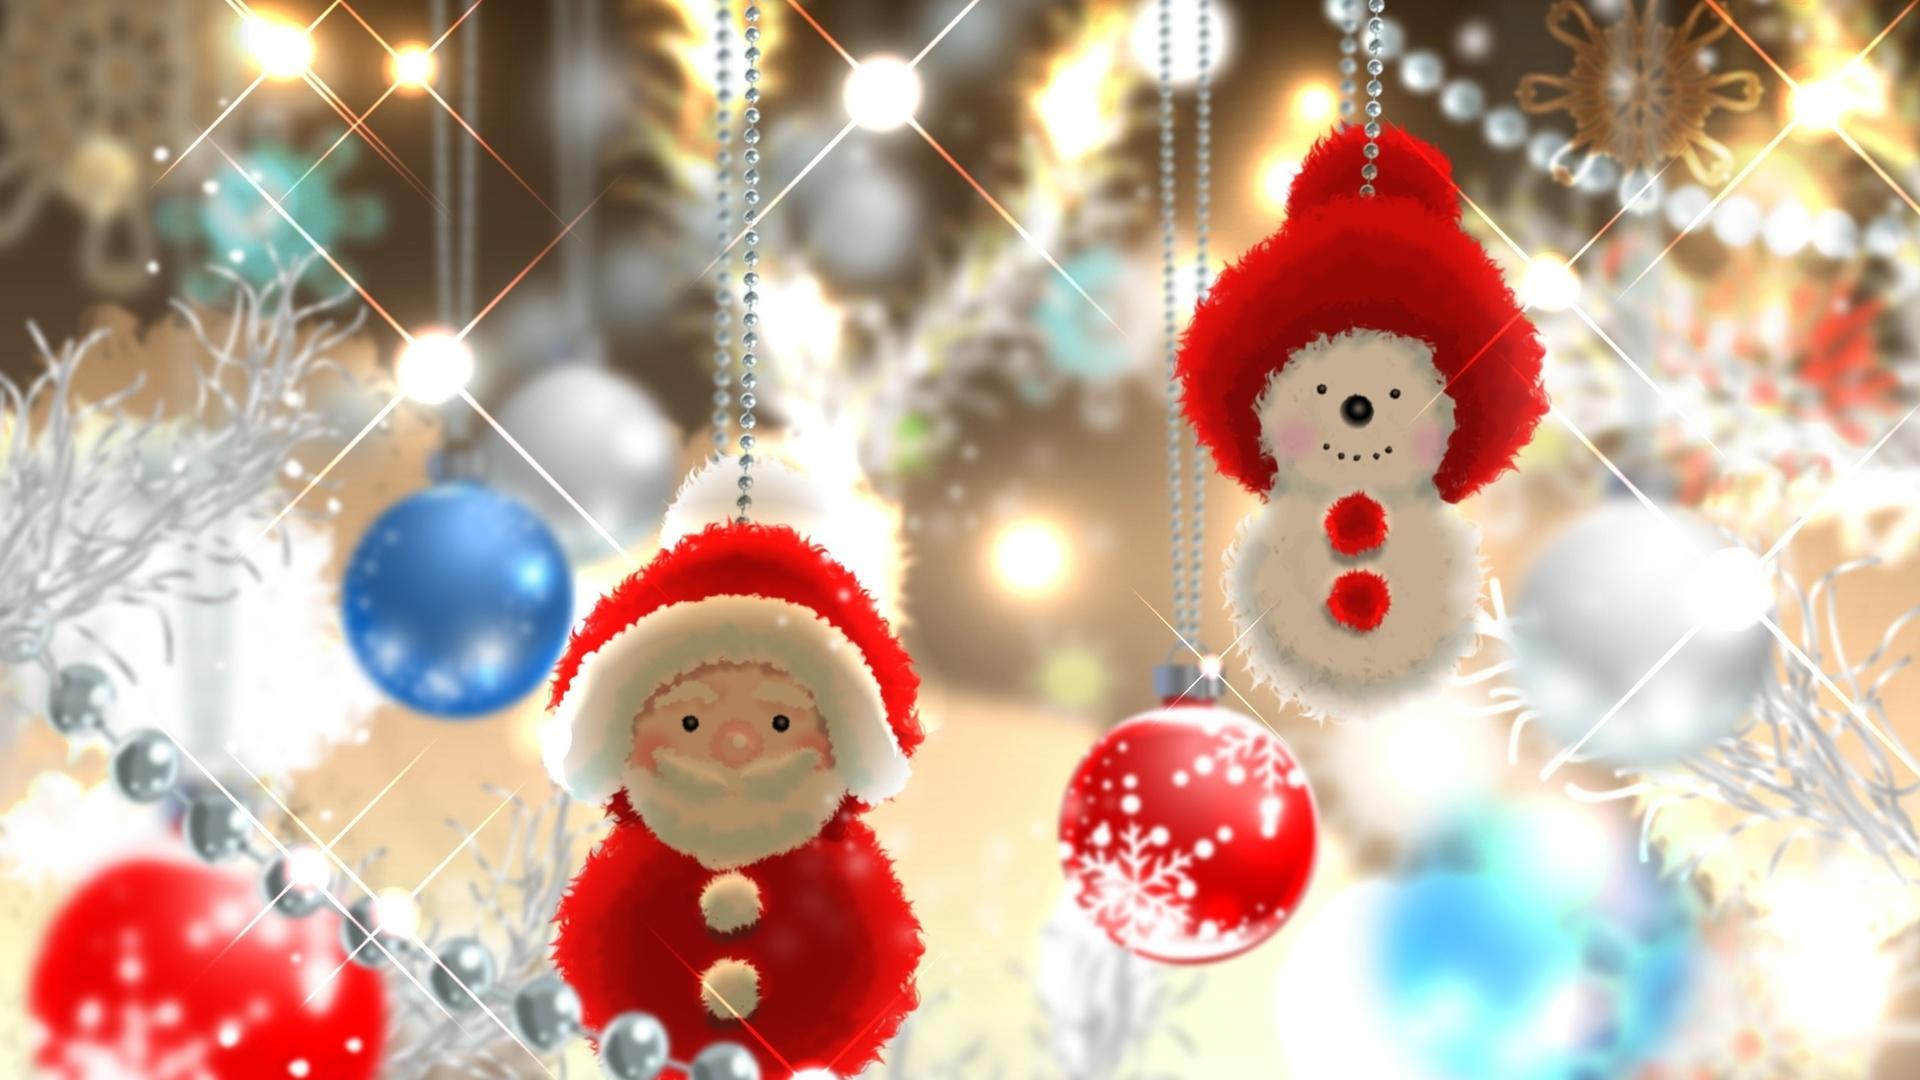 Holidays Christmas Seasonal Festive Hd Wallpaper 1467018: #HolidaySales Tip #2: The Simplest Sales Hook Is A Festive